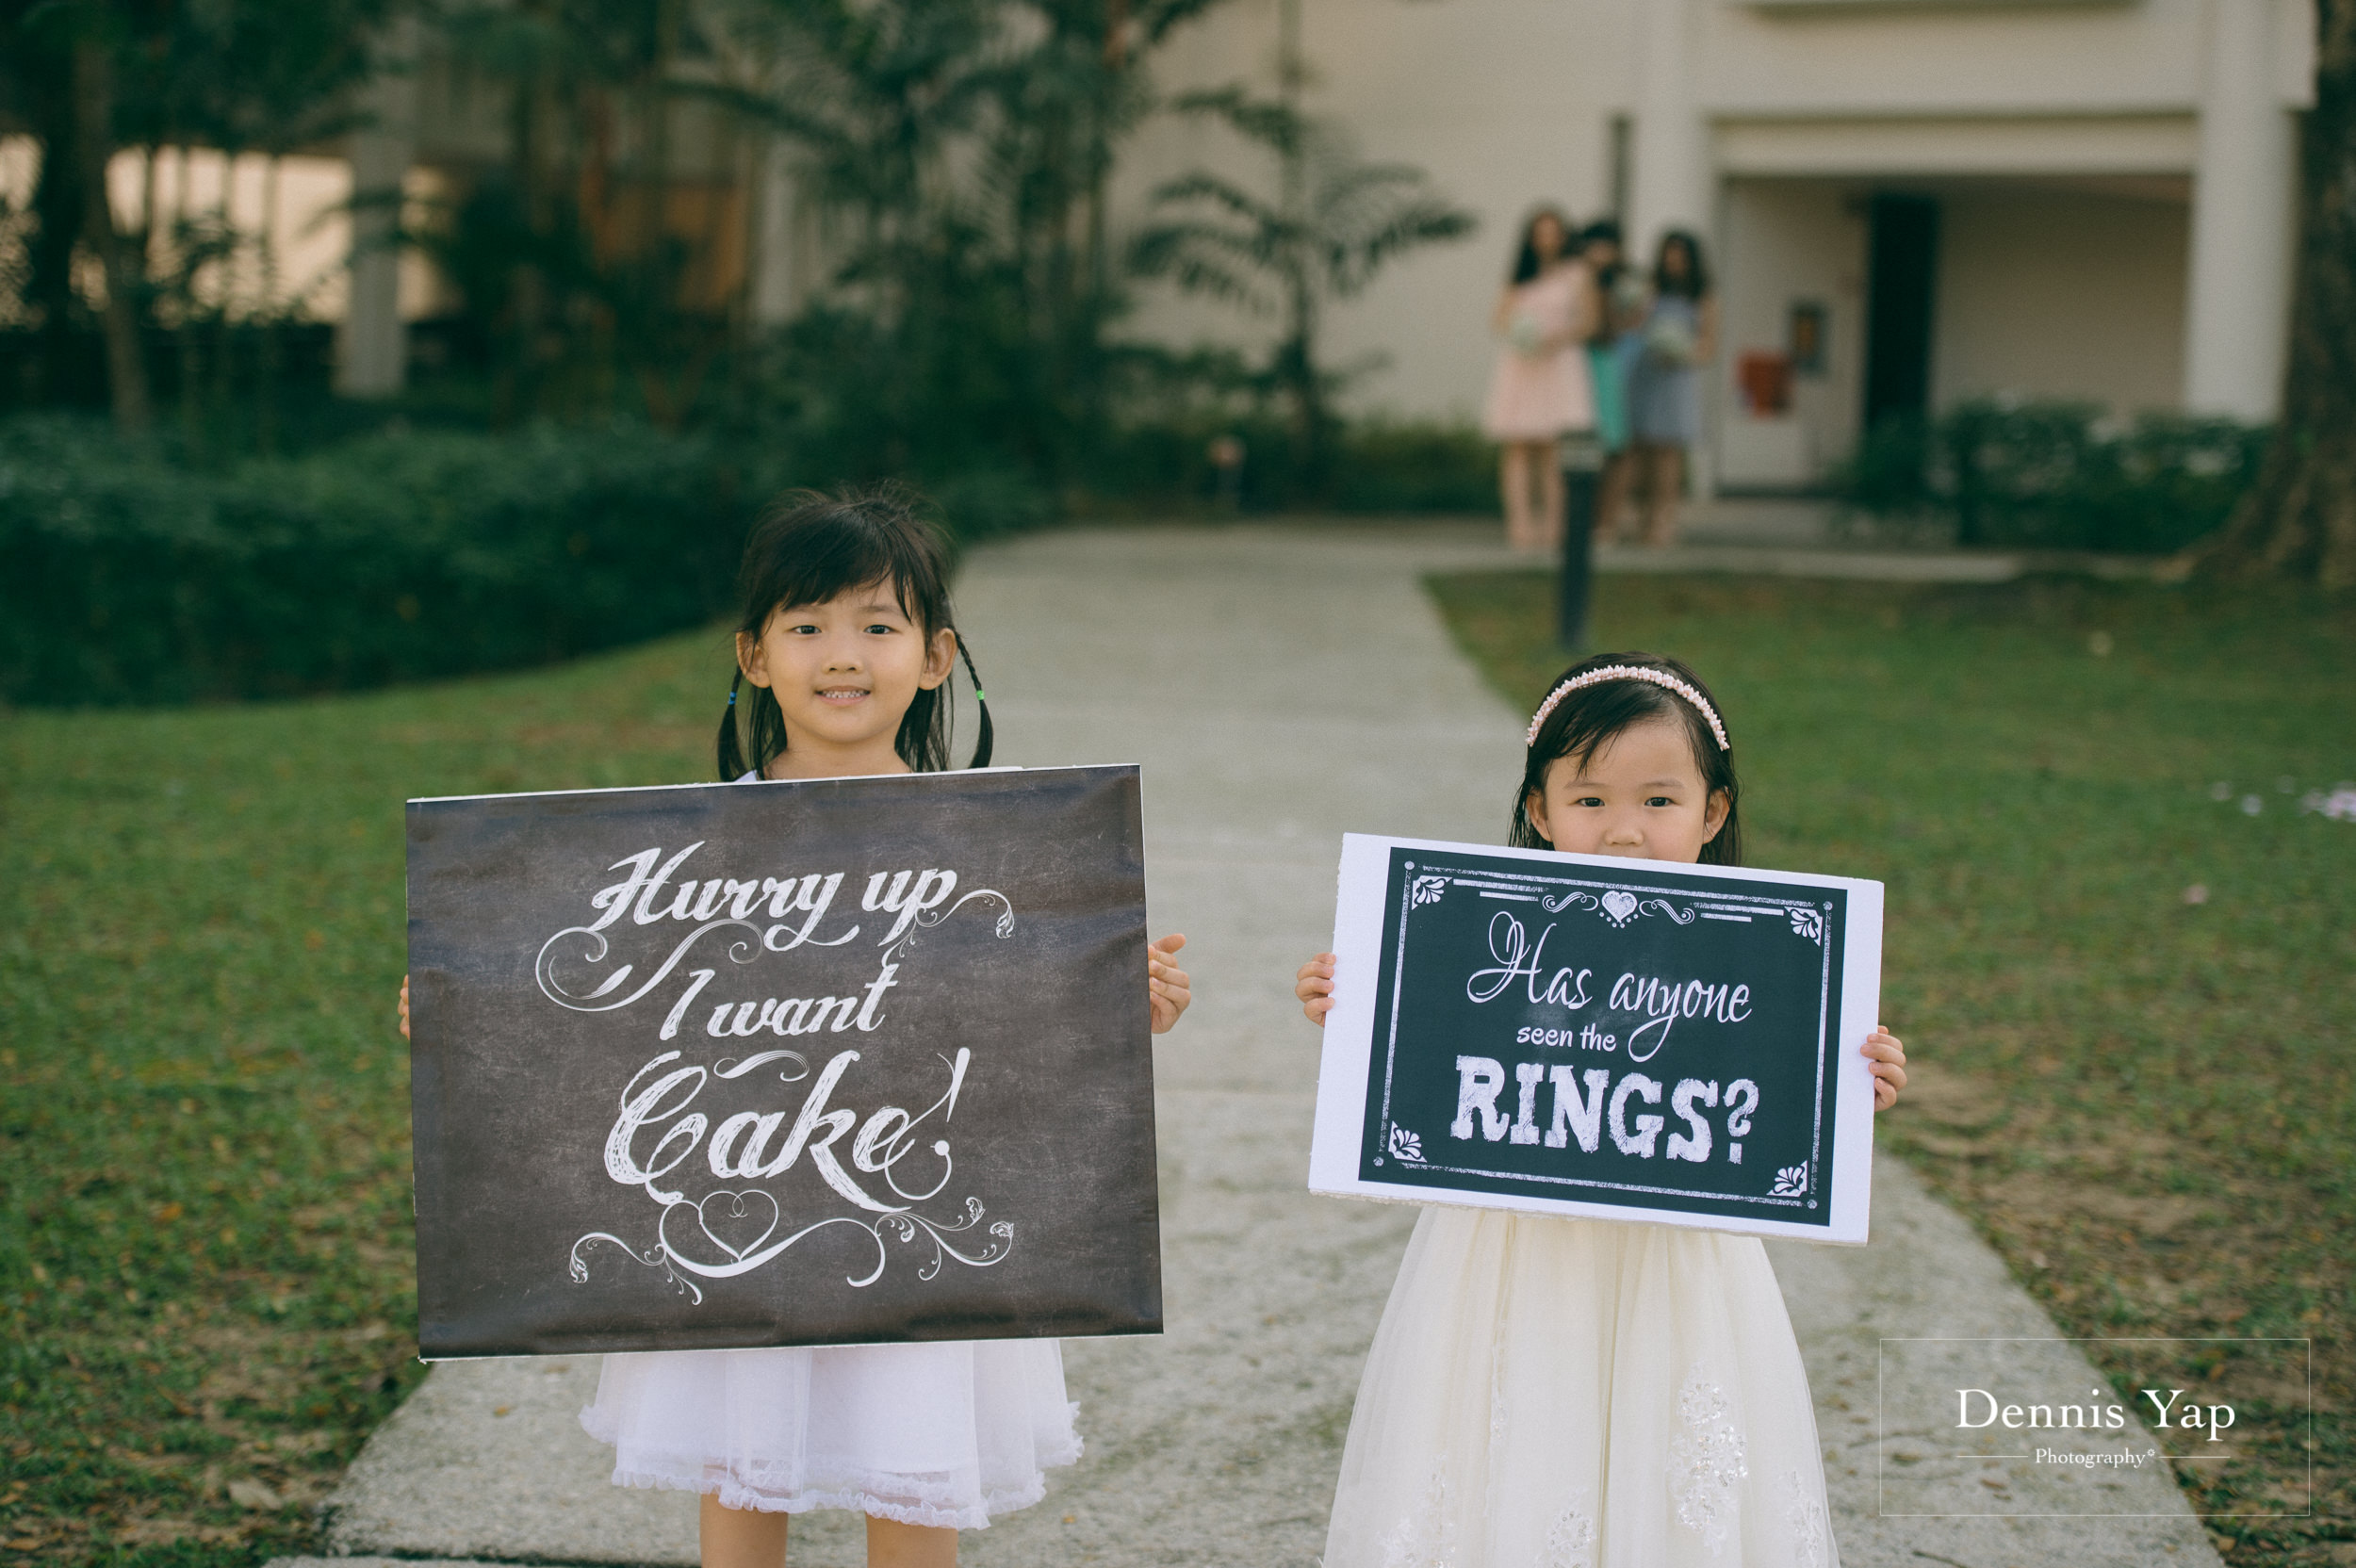 taylai cheng yee garden wedding saujana hotel subang jaya dennis yap photography sunlight-12.jpg